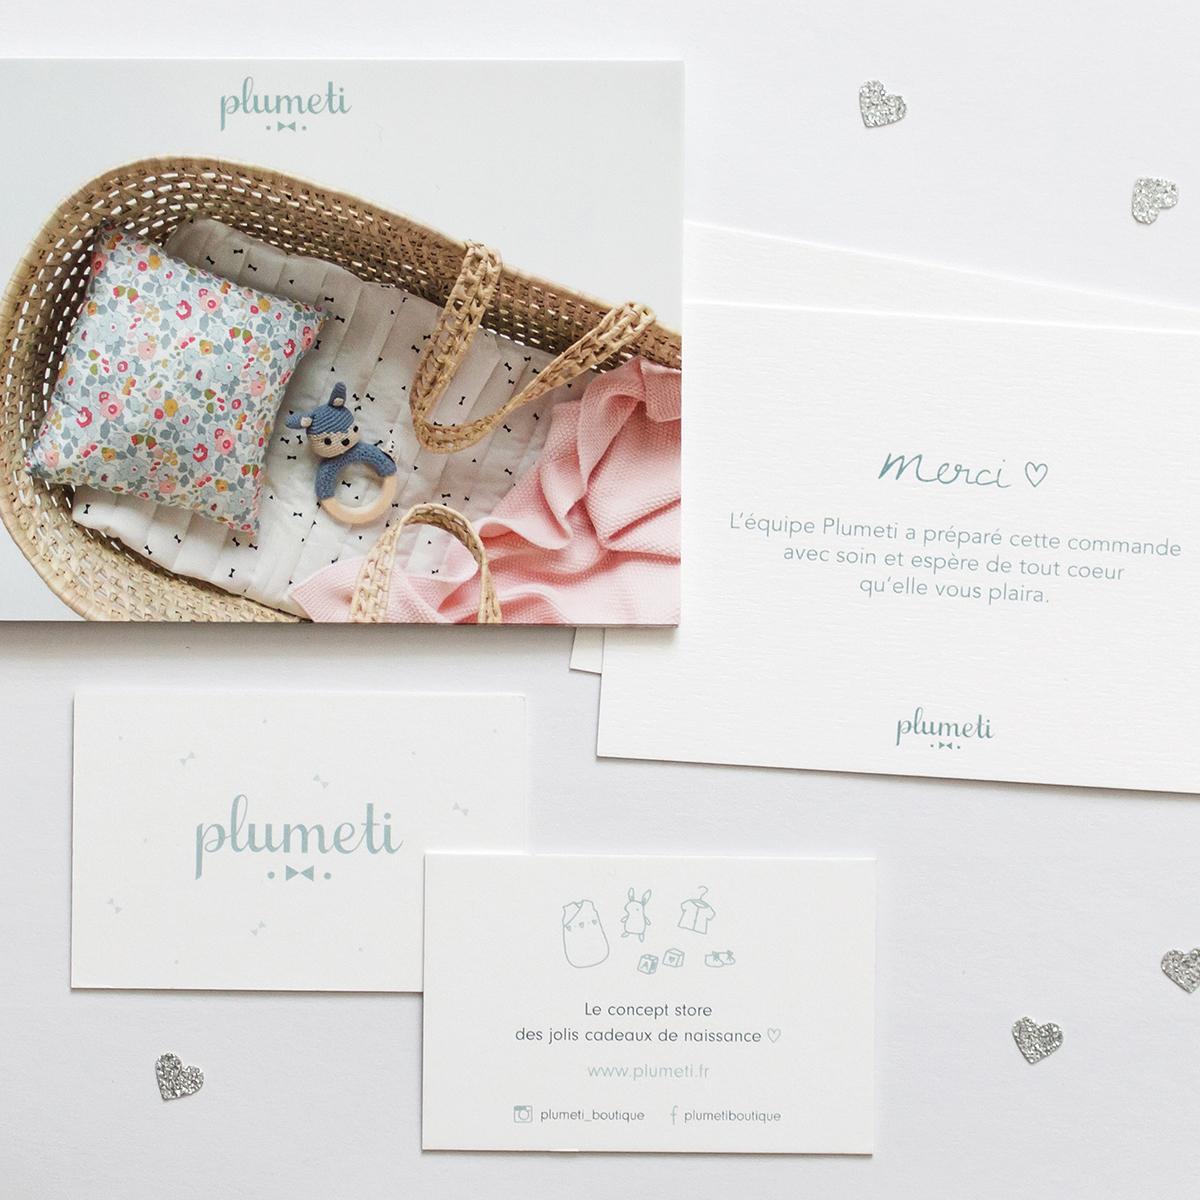 Papetertie Plumeti - Papeterie - Graphisme - Création - Charlène Roudier